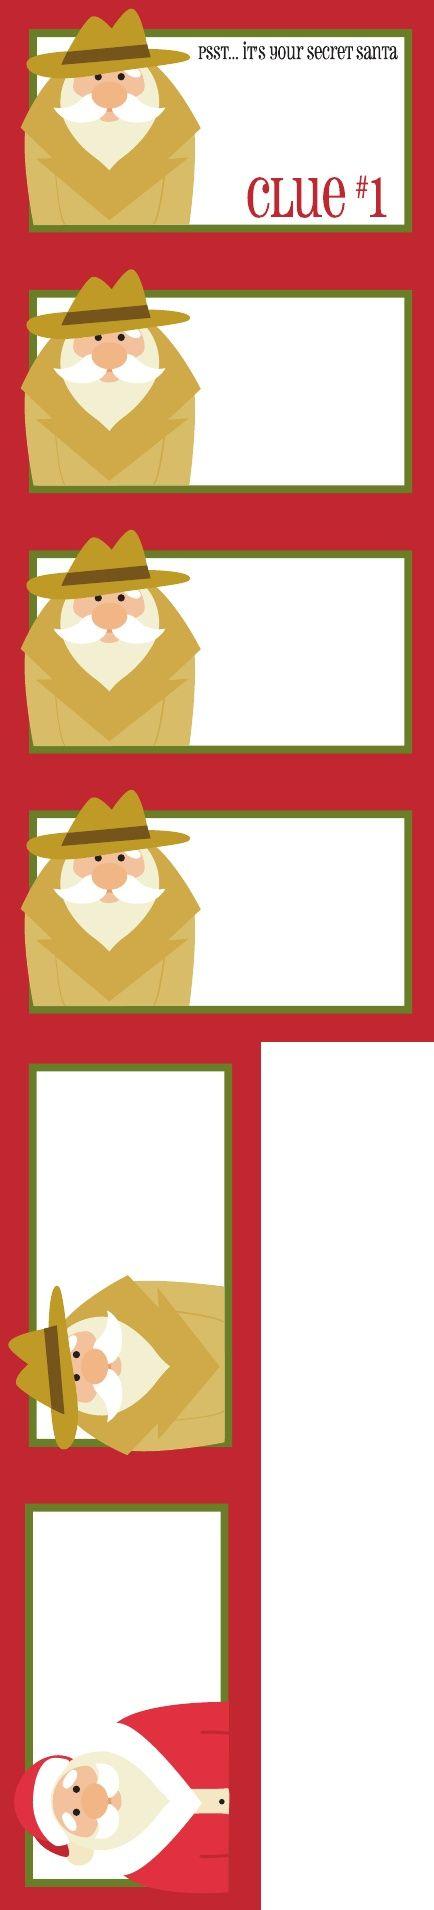 Santa Questionnaire Printable Free printable secret santa gift tags ...